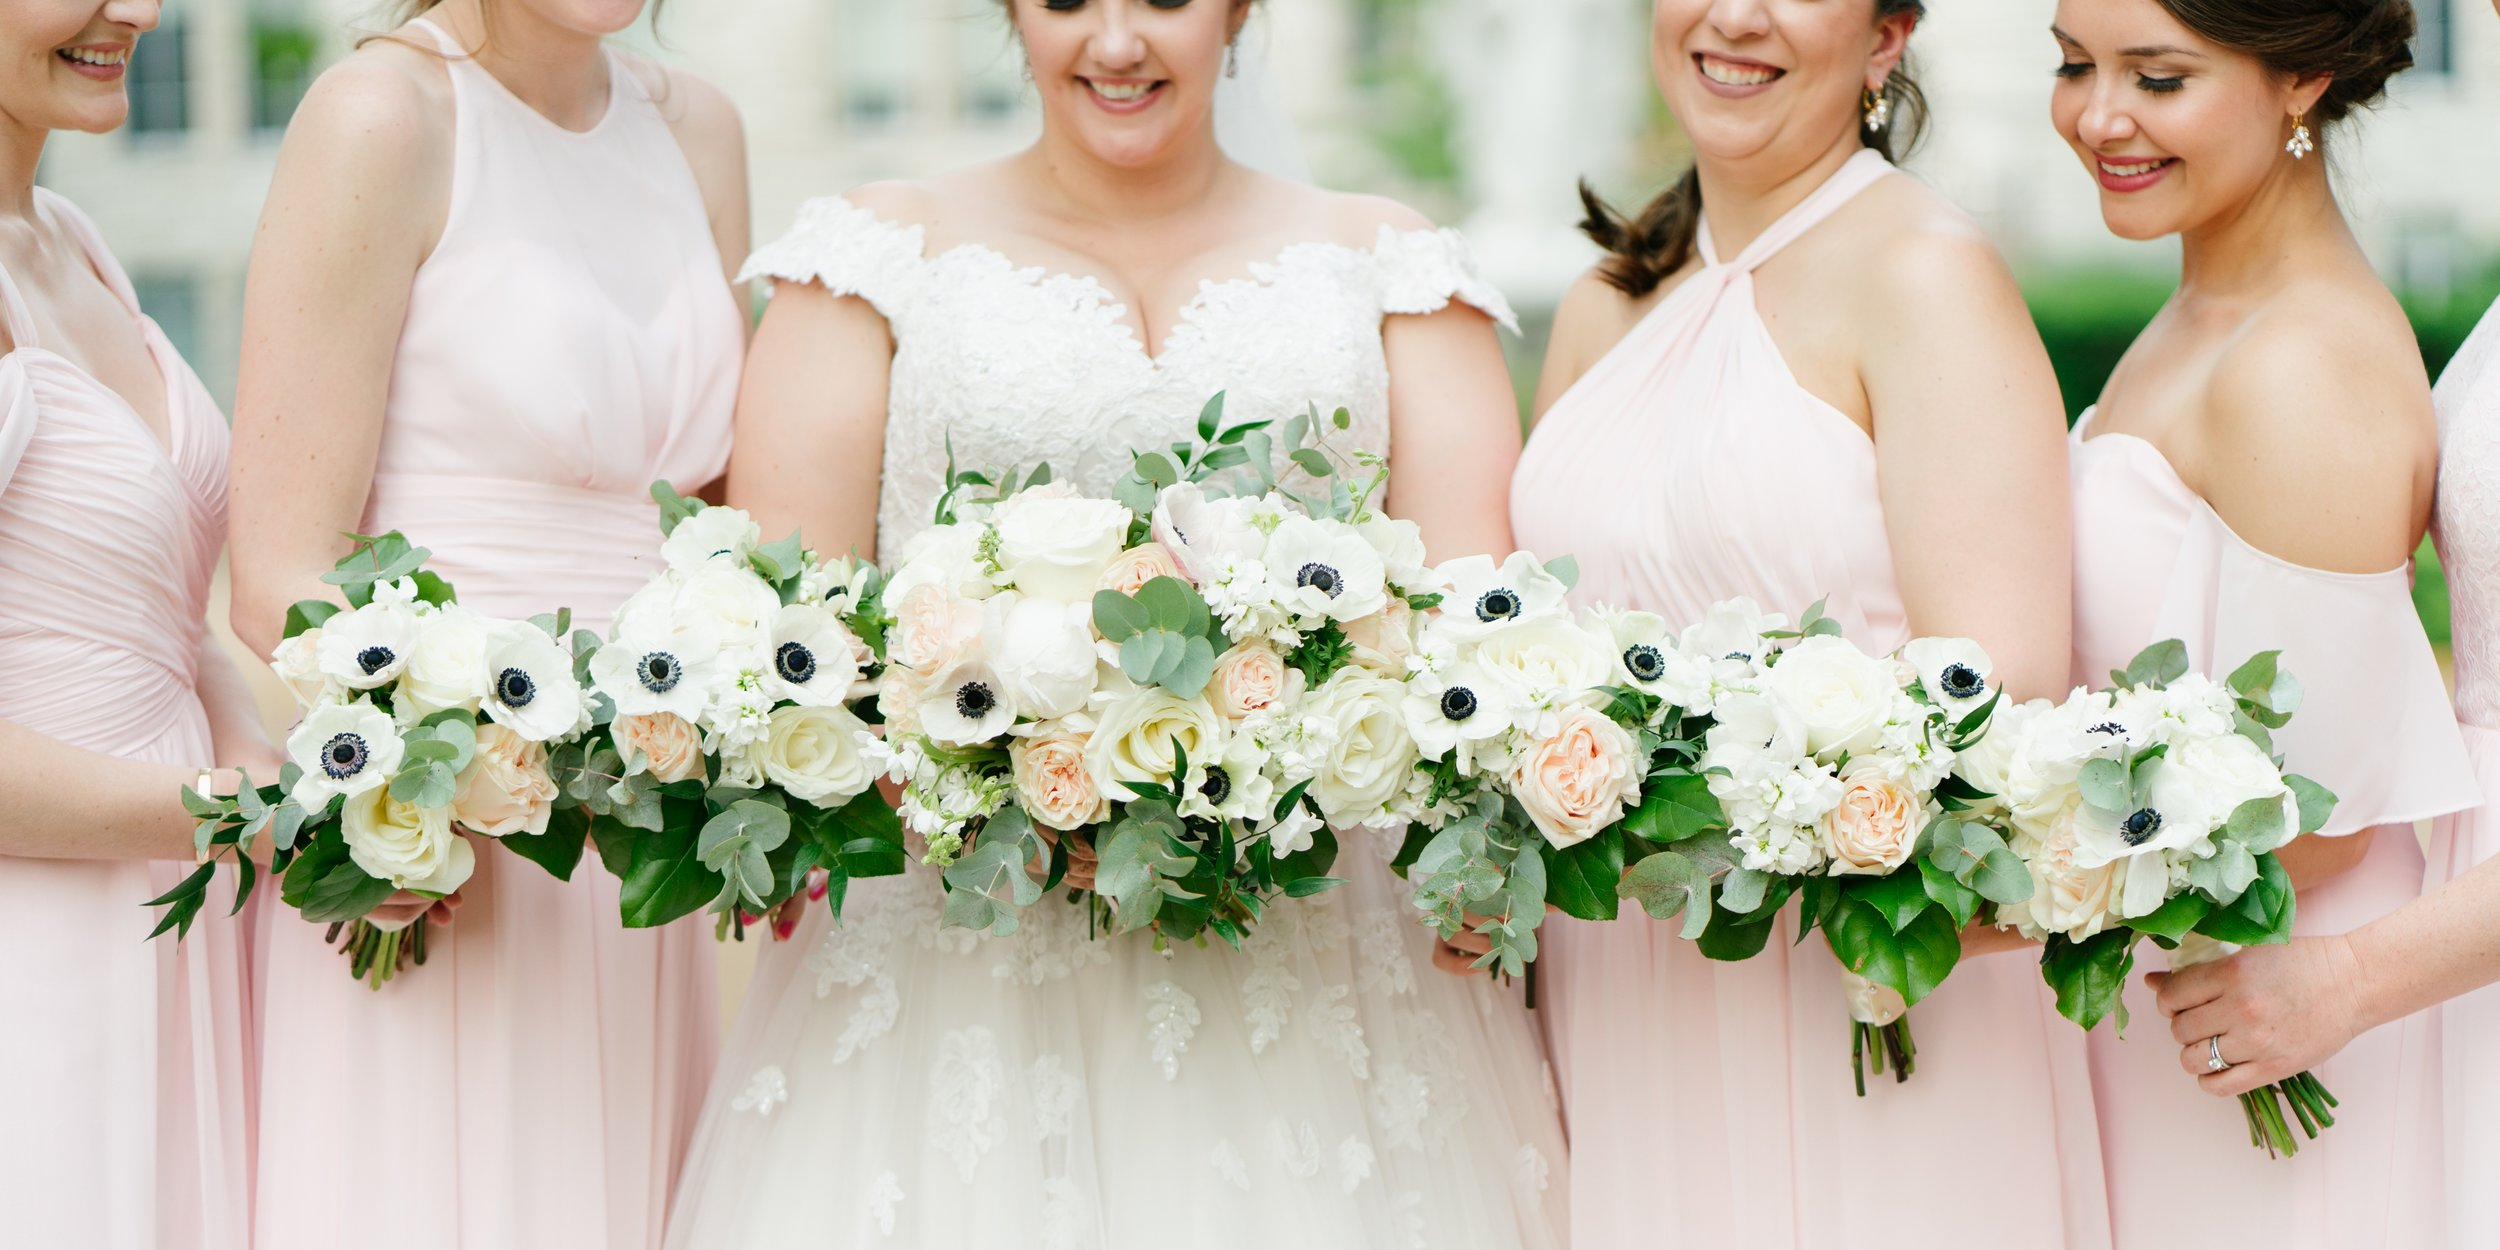 wedding bouquet at wedding in los angeles